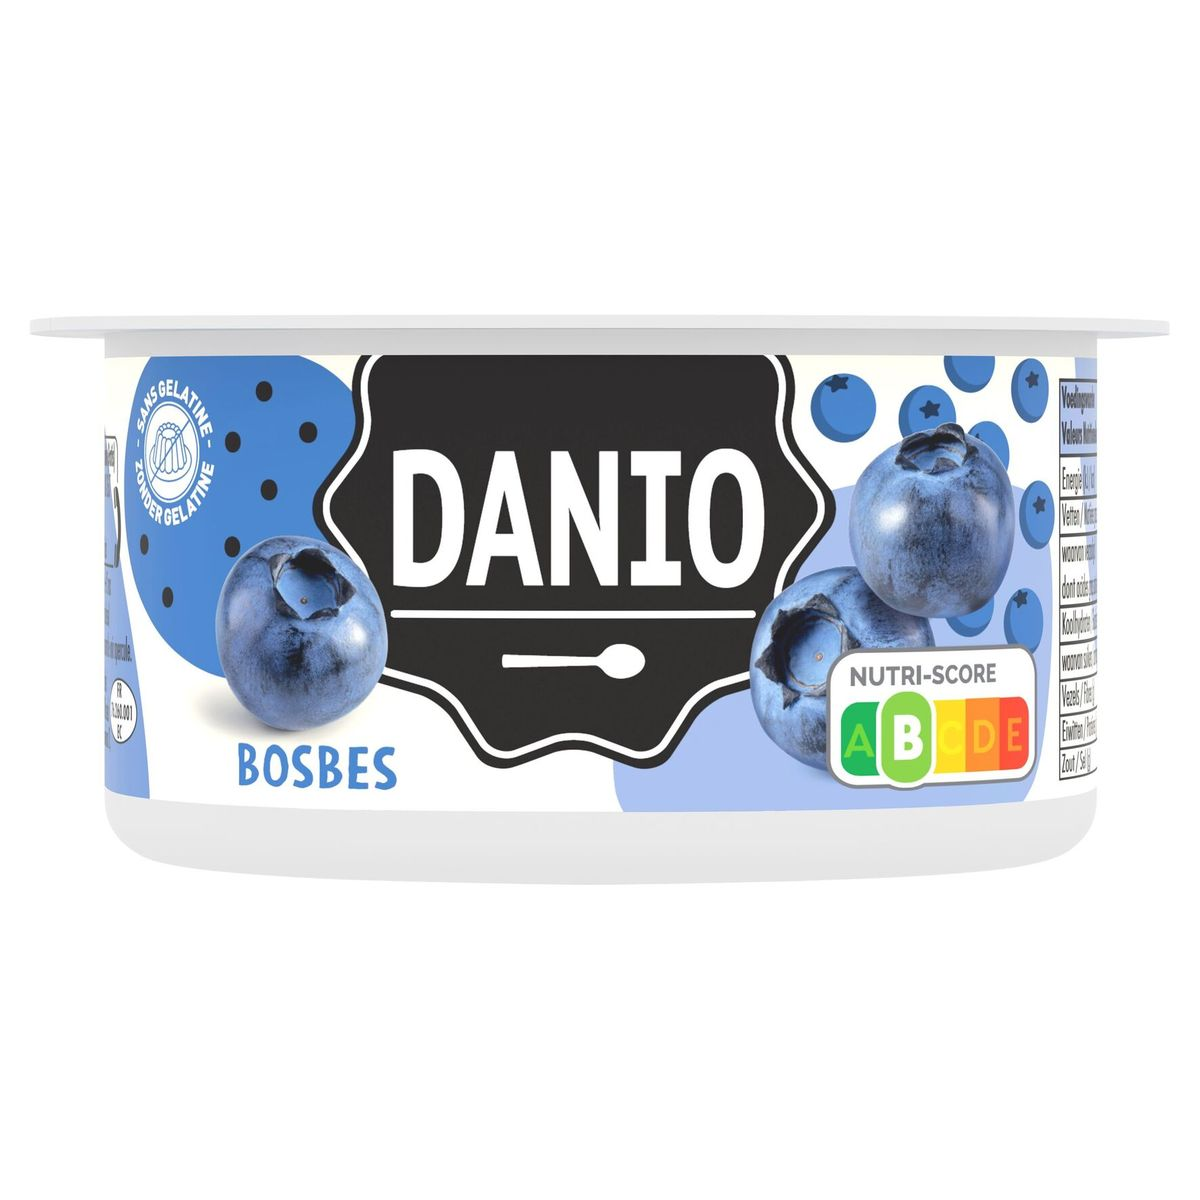 Danio Bosbes 180 g